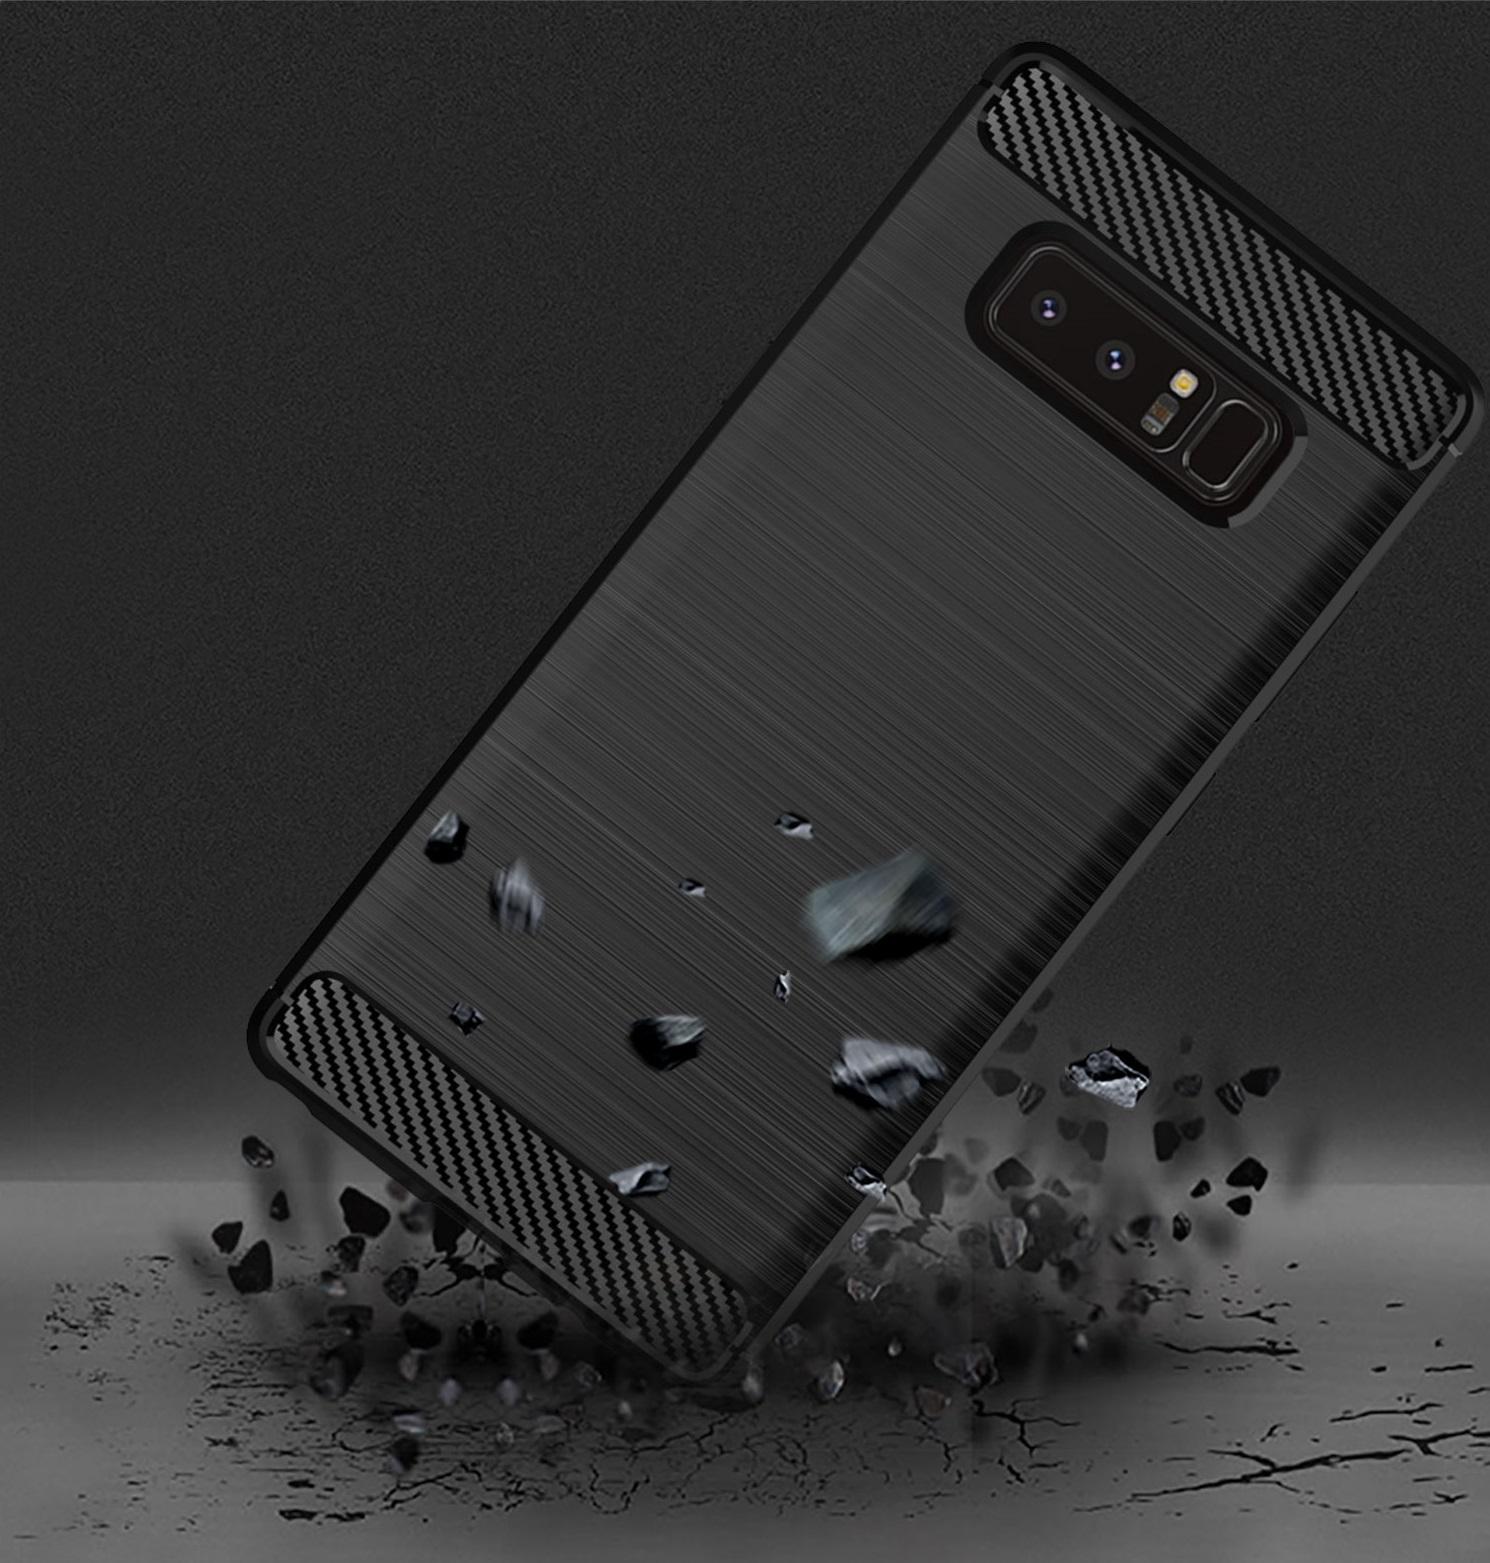 Чехол для Samsung Galaxy Note 8  цвет Gray (серый), серия Carbon от Caseport